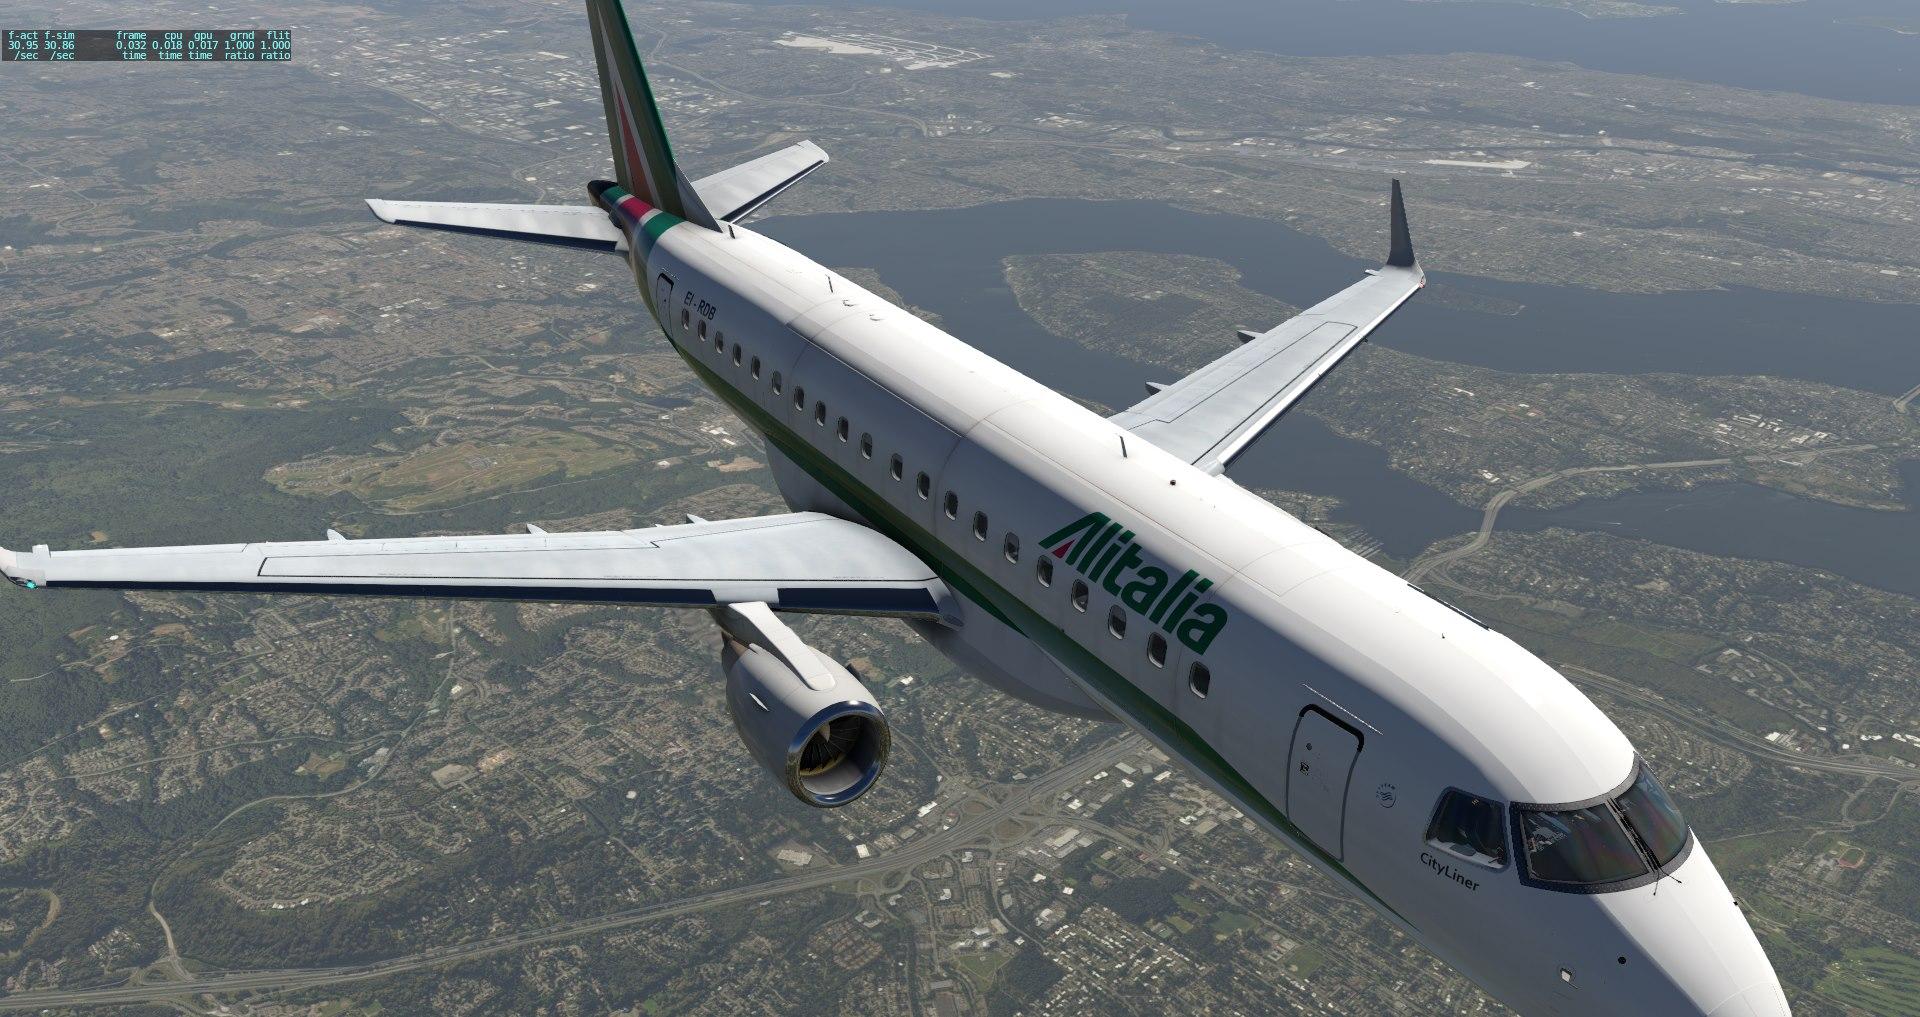 Embraer E175 допил под X-Plane 11 - Самолеты для X-Plane 11 - AVSIM